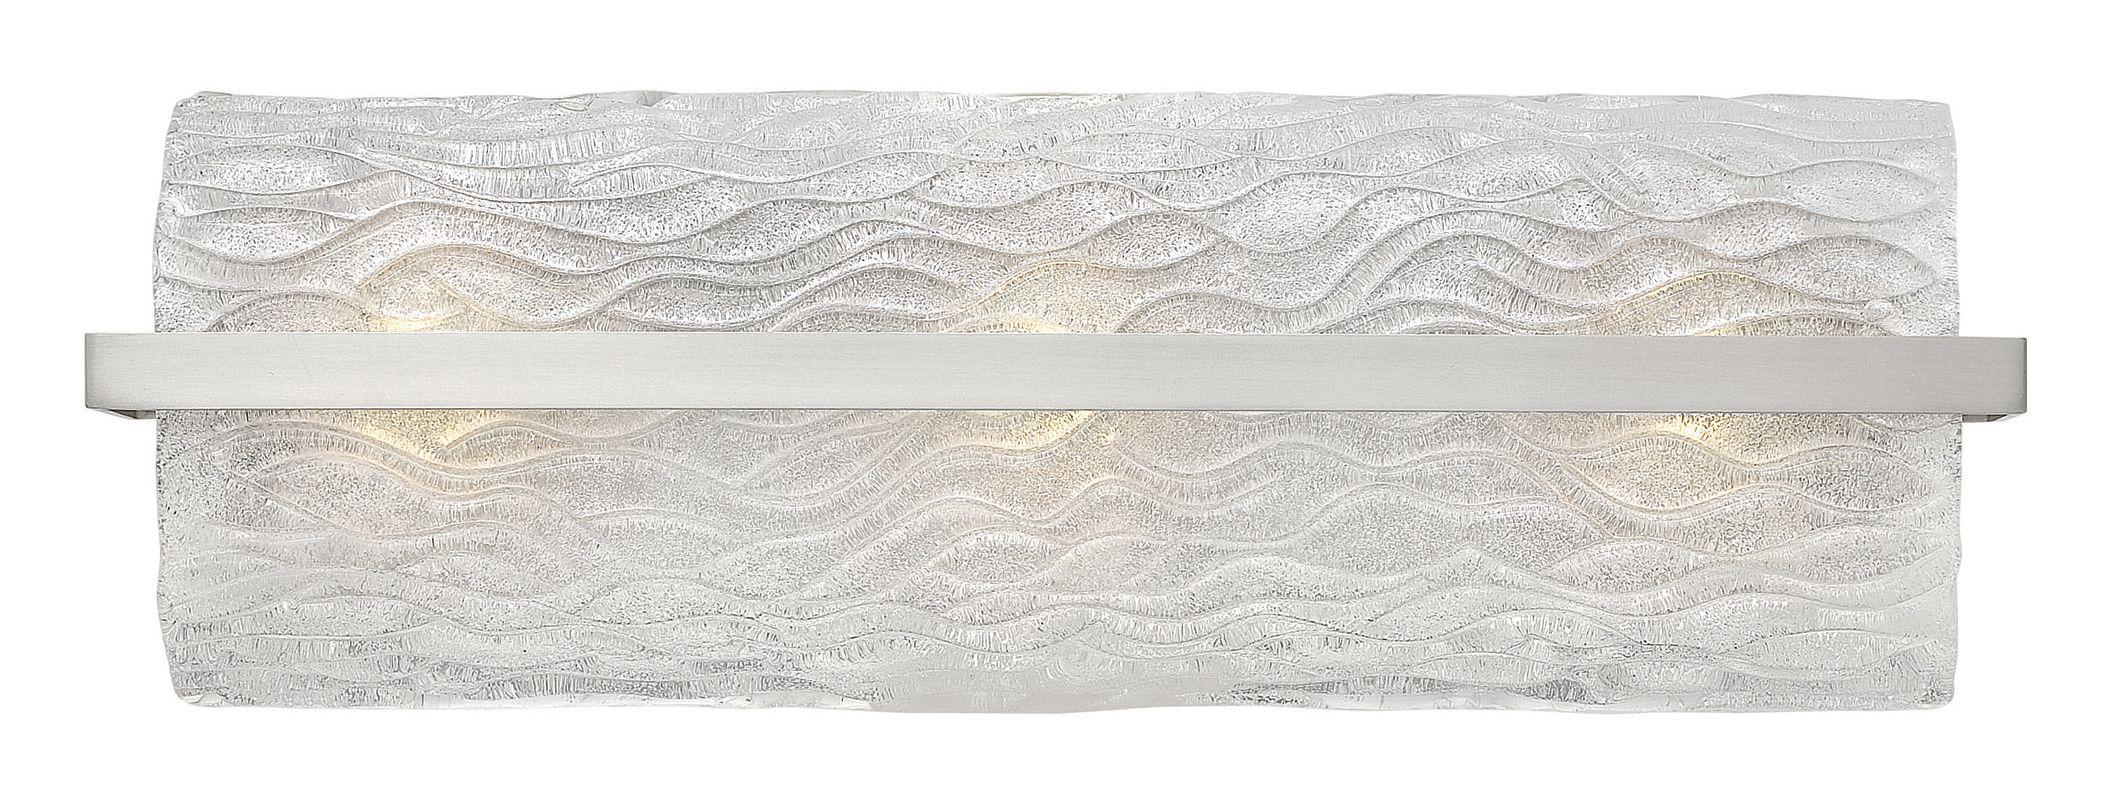 Hinkley Lighting 52403 3 Light ADA Compliant Bathroom Sconce from the